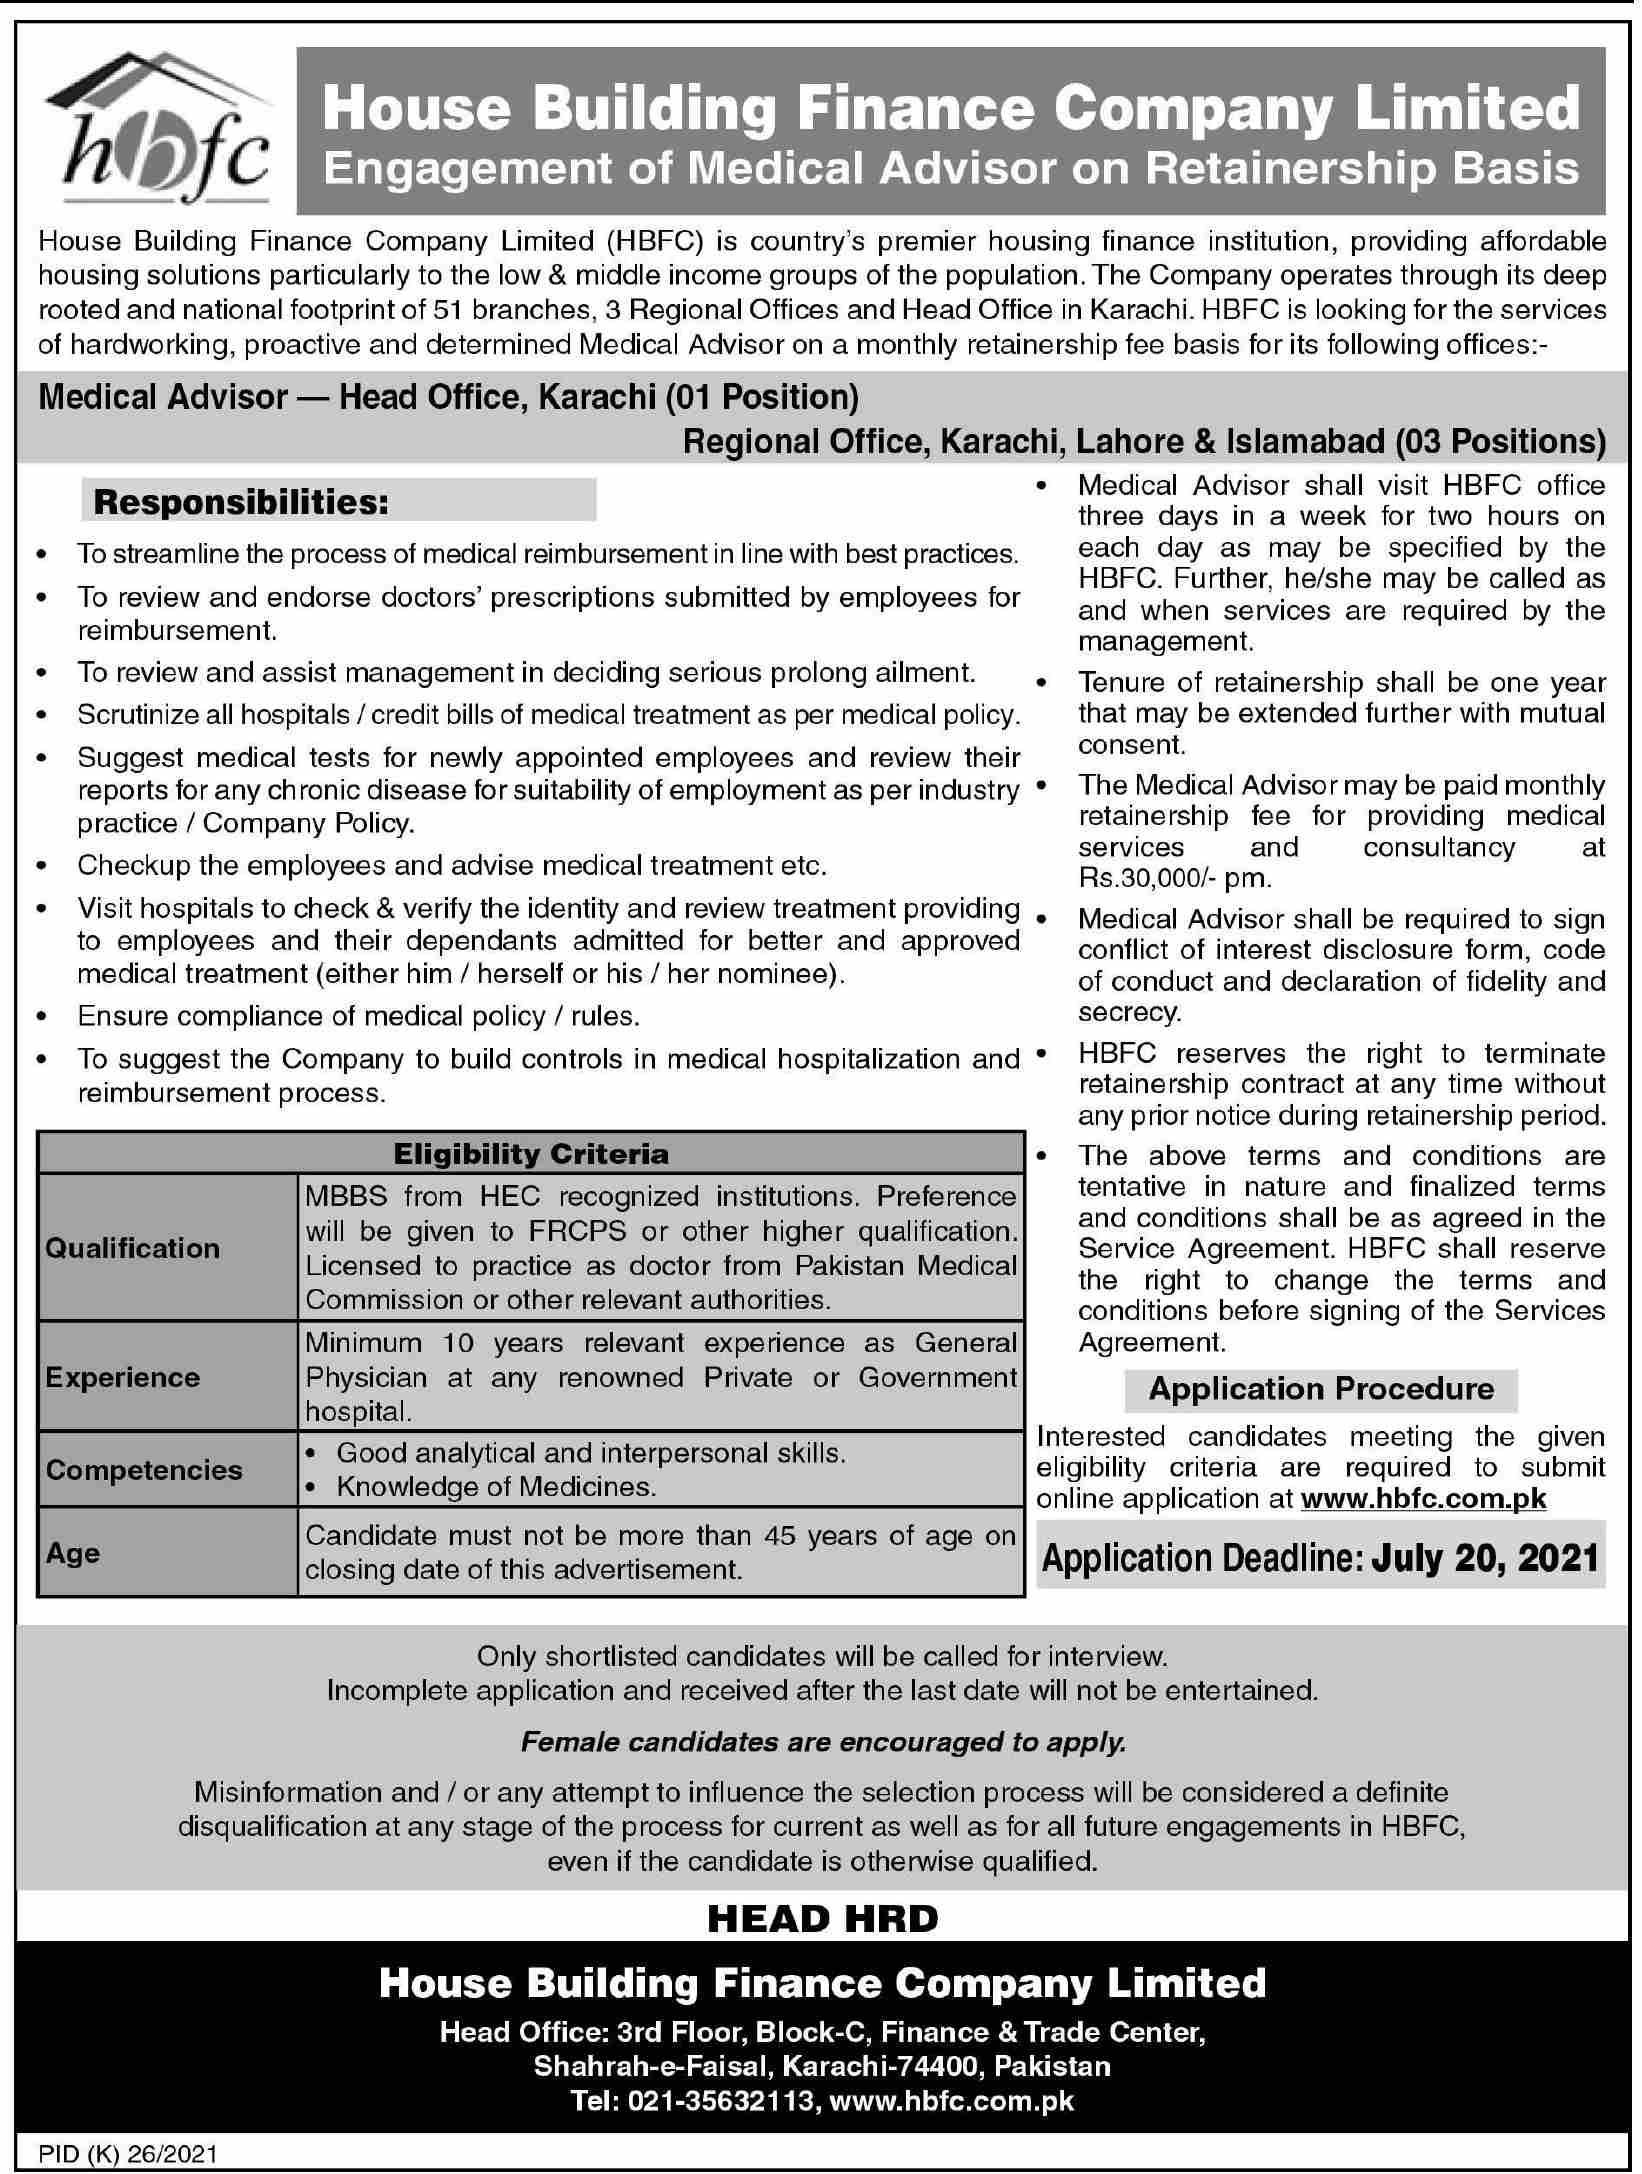 HBFC Company Medical Advisor Jobs 2021